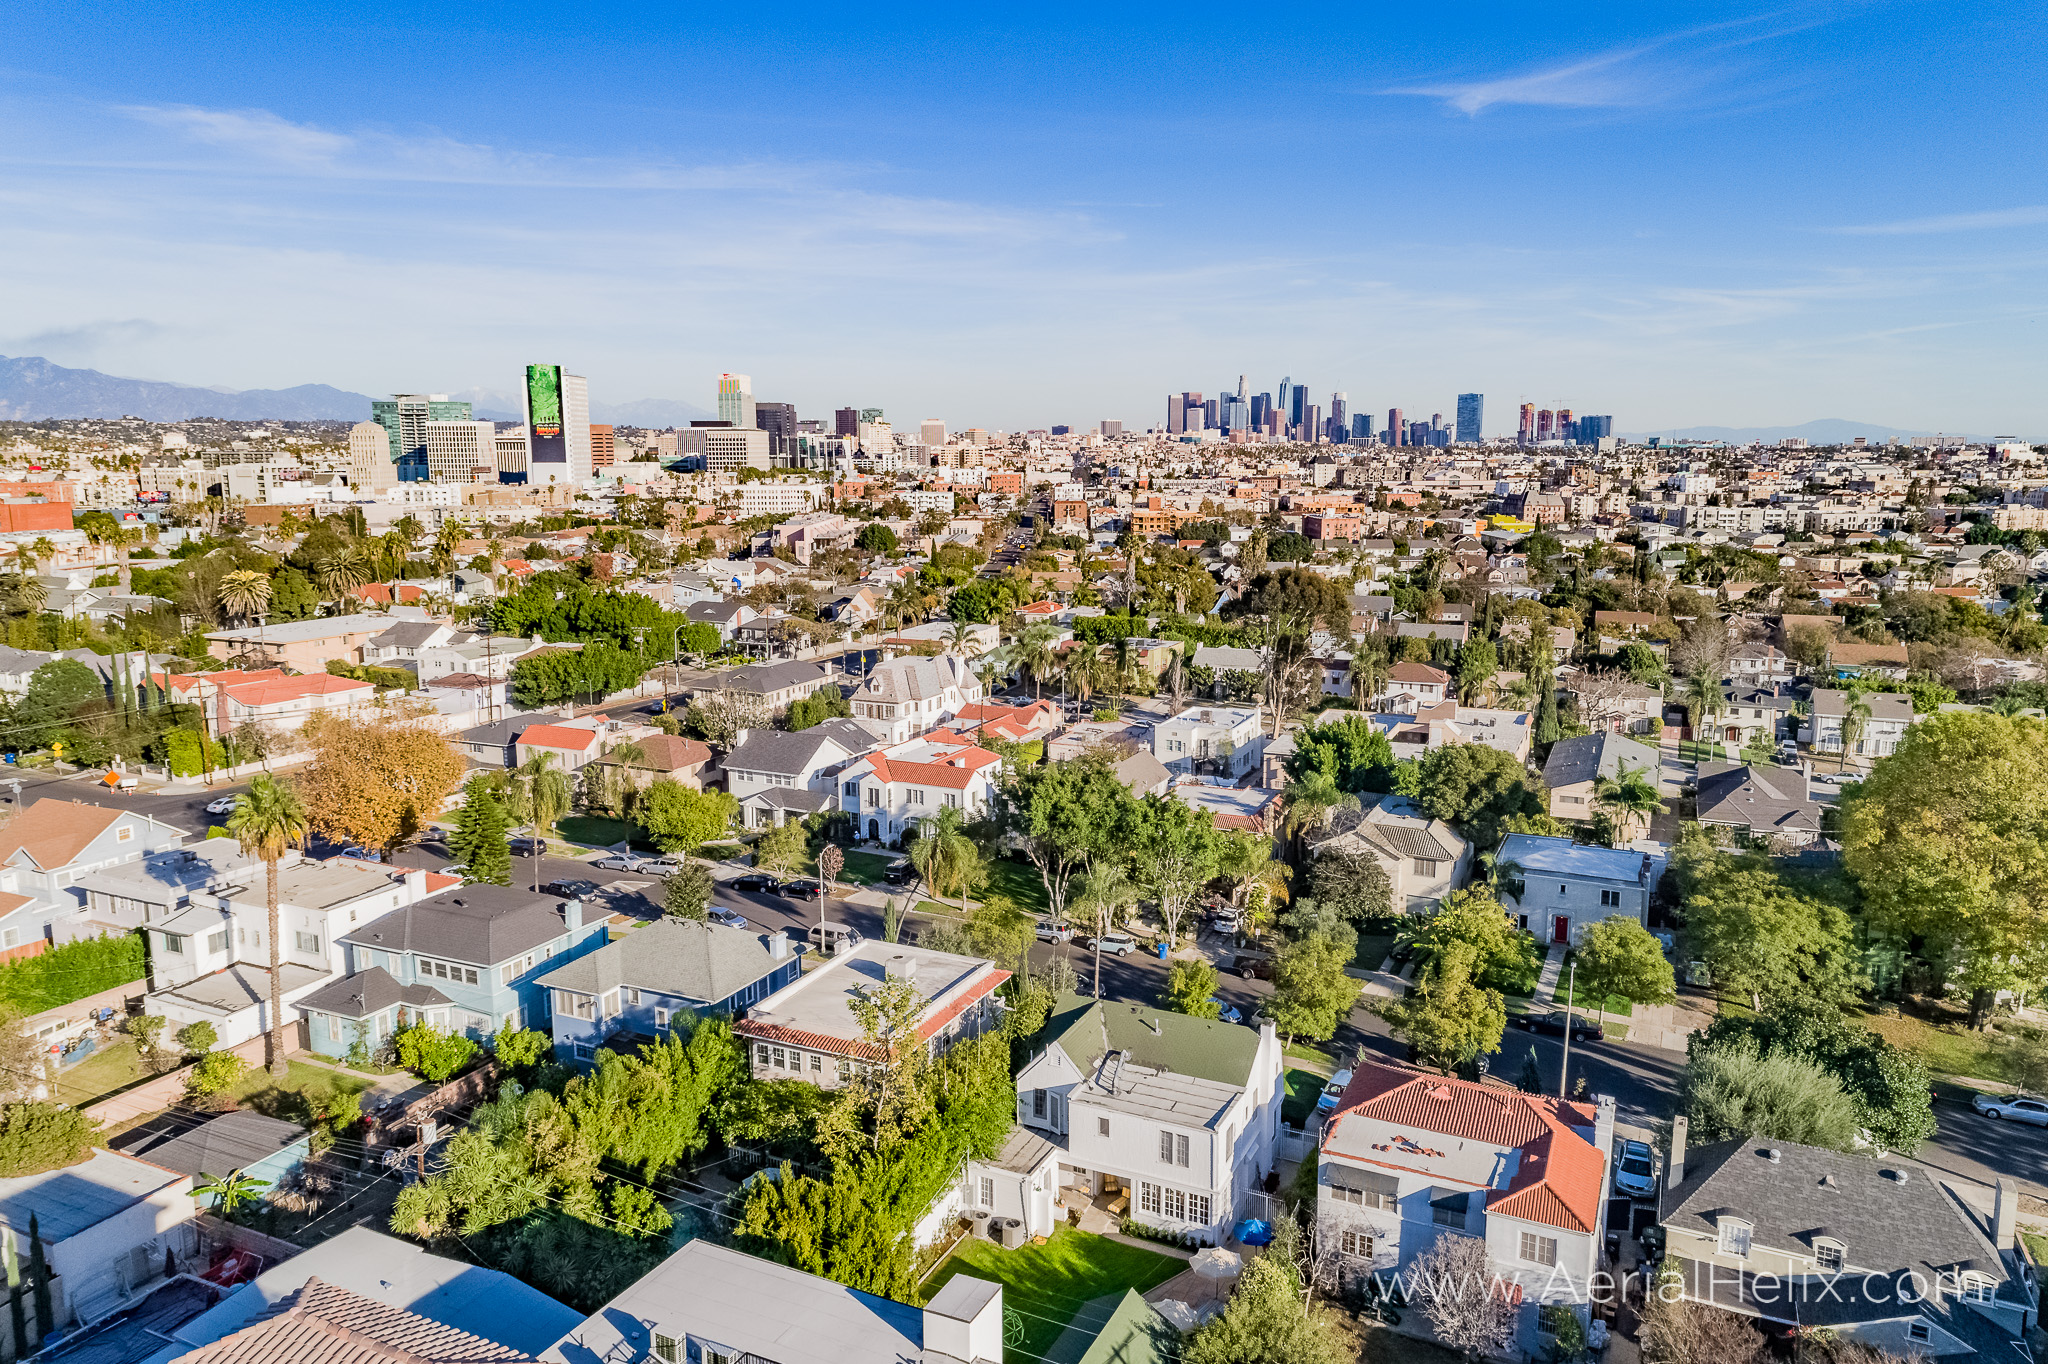 Crenshaw Blvd Aerial-7.jpg